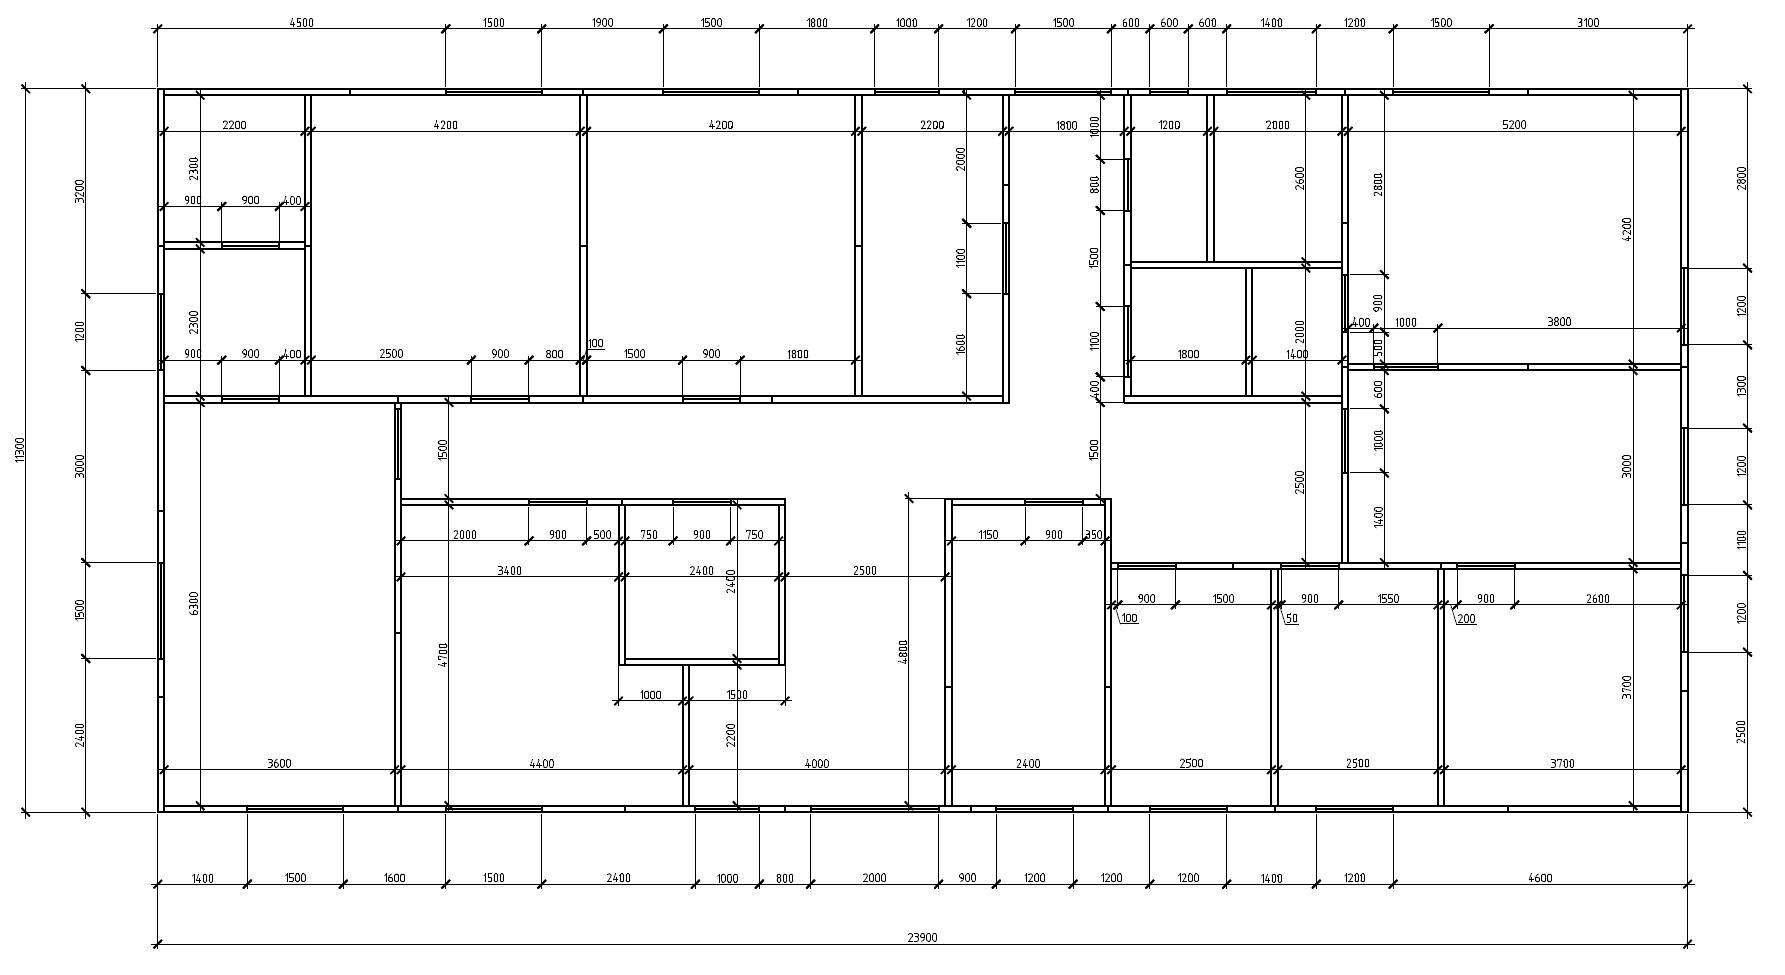 2020-10-09_17-42-08